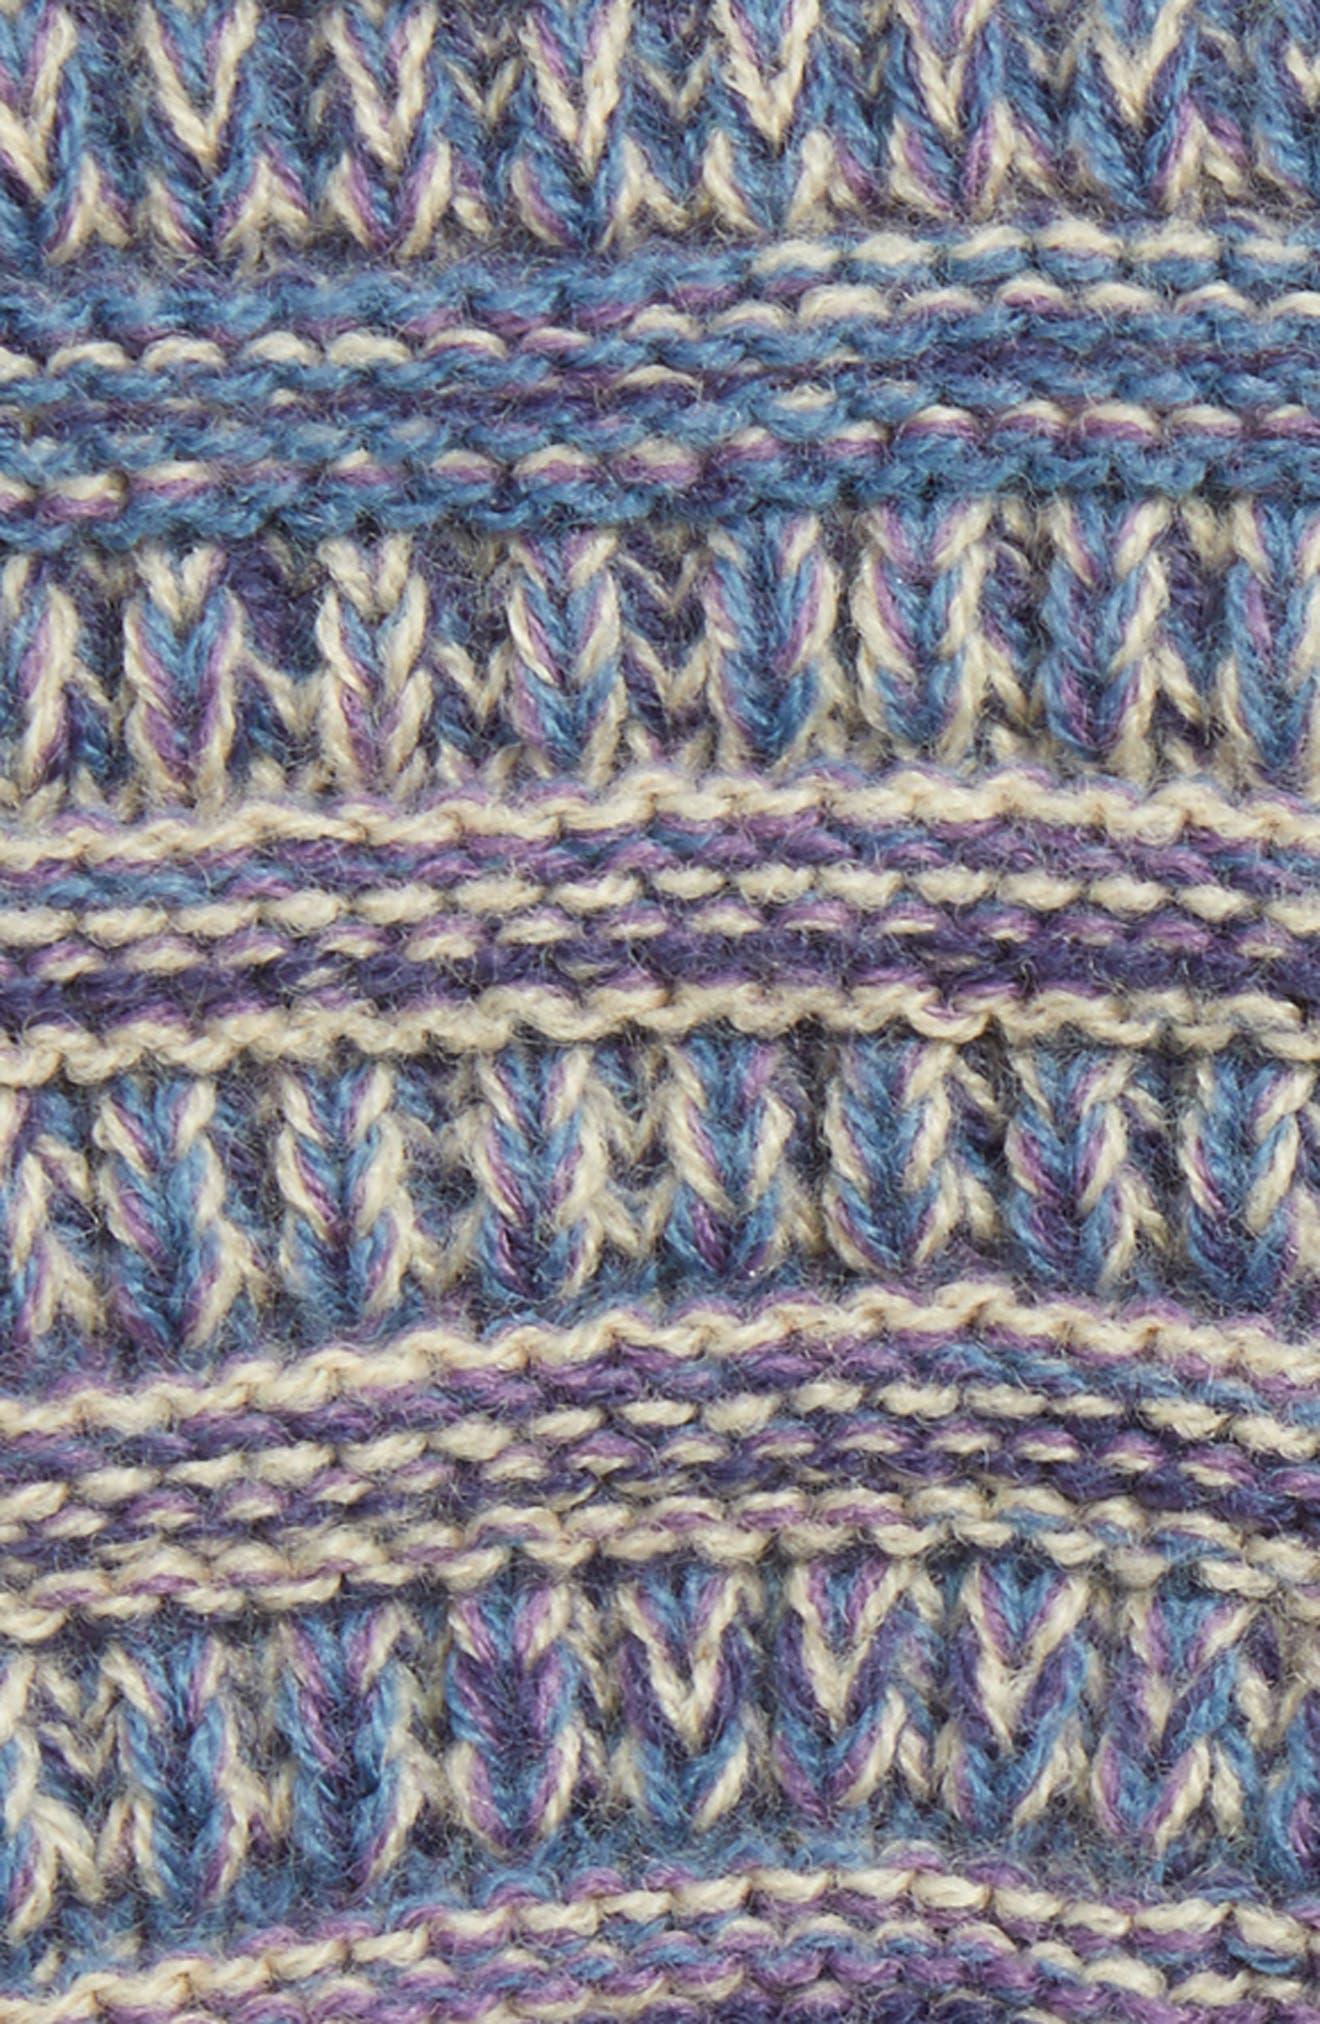 Knit Tech Gloves,                             Alternate thumbnail 2, color,                             Purple/ Dark Denim/ Beige